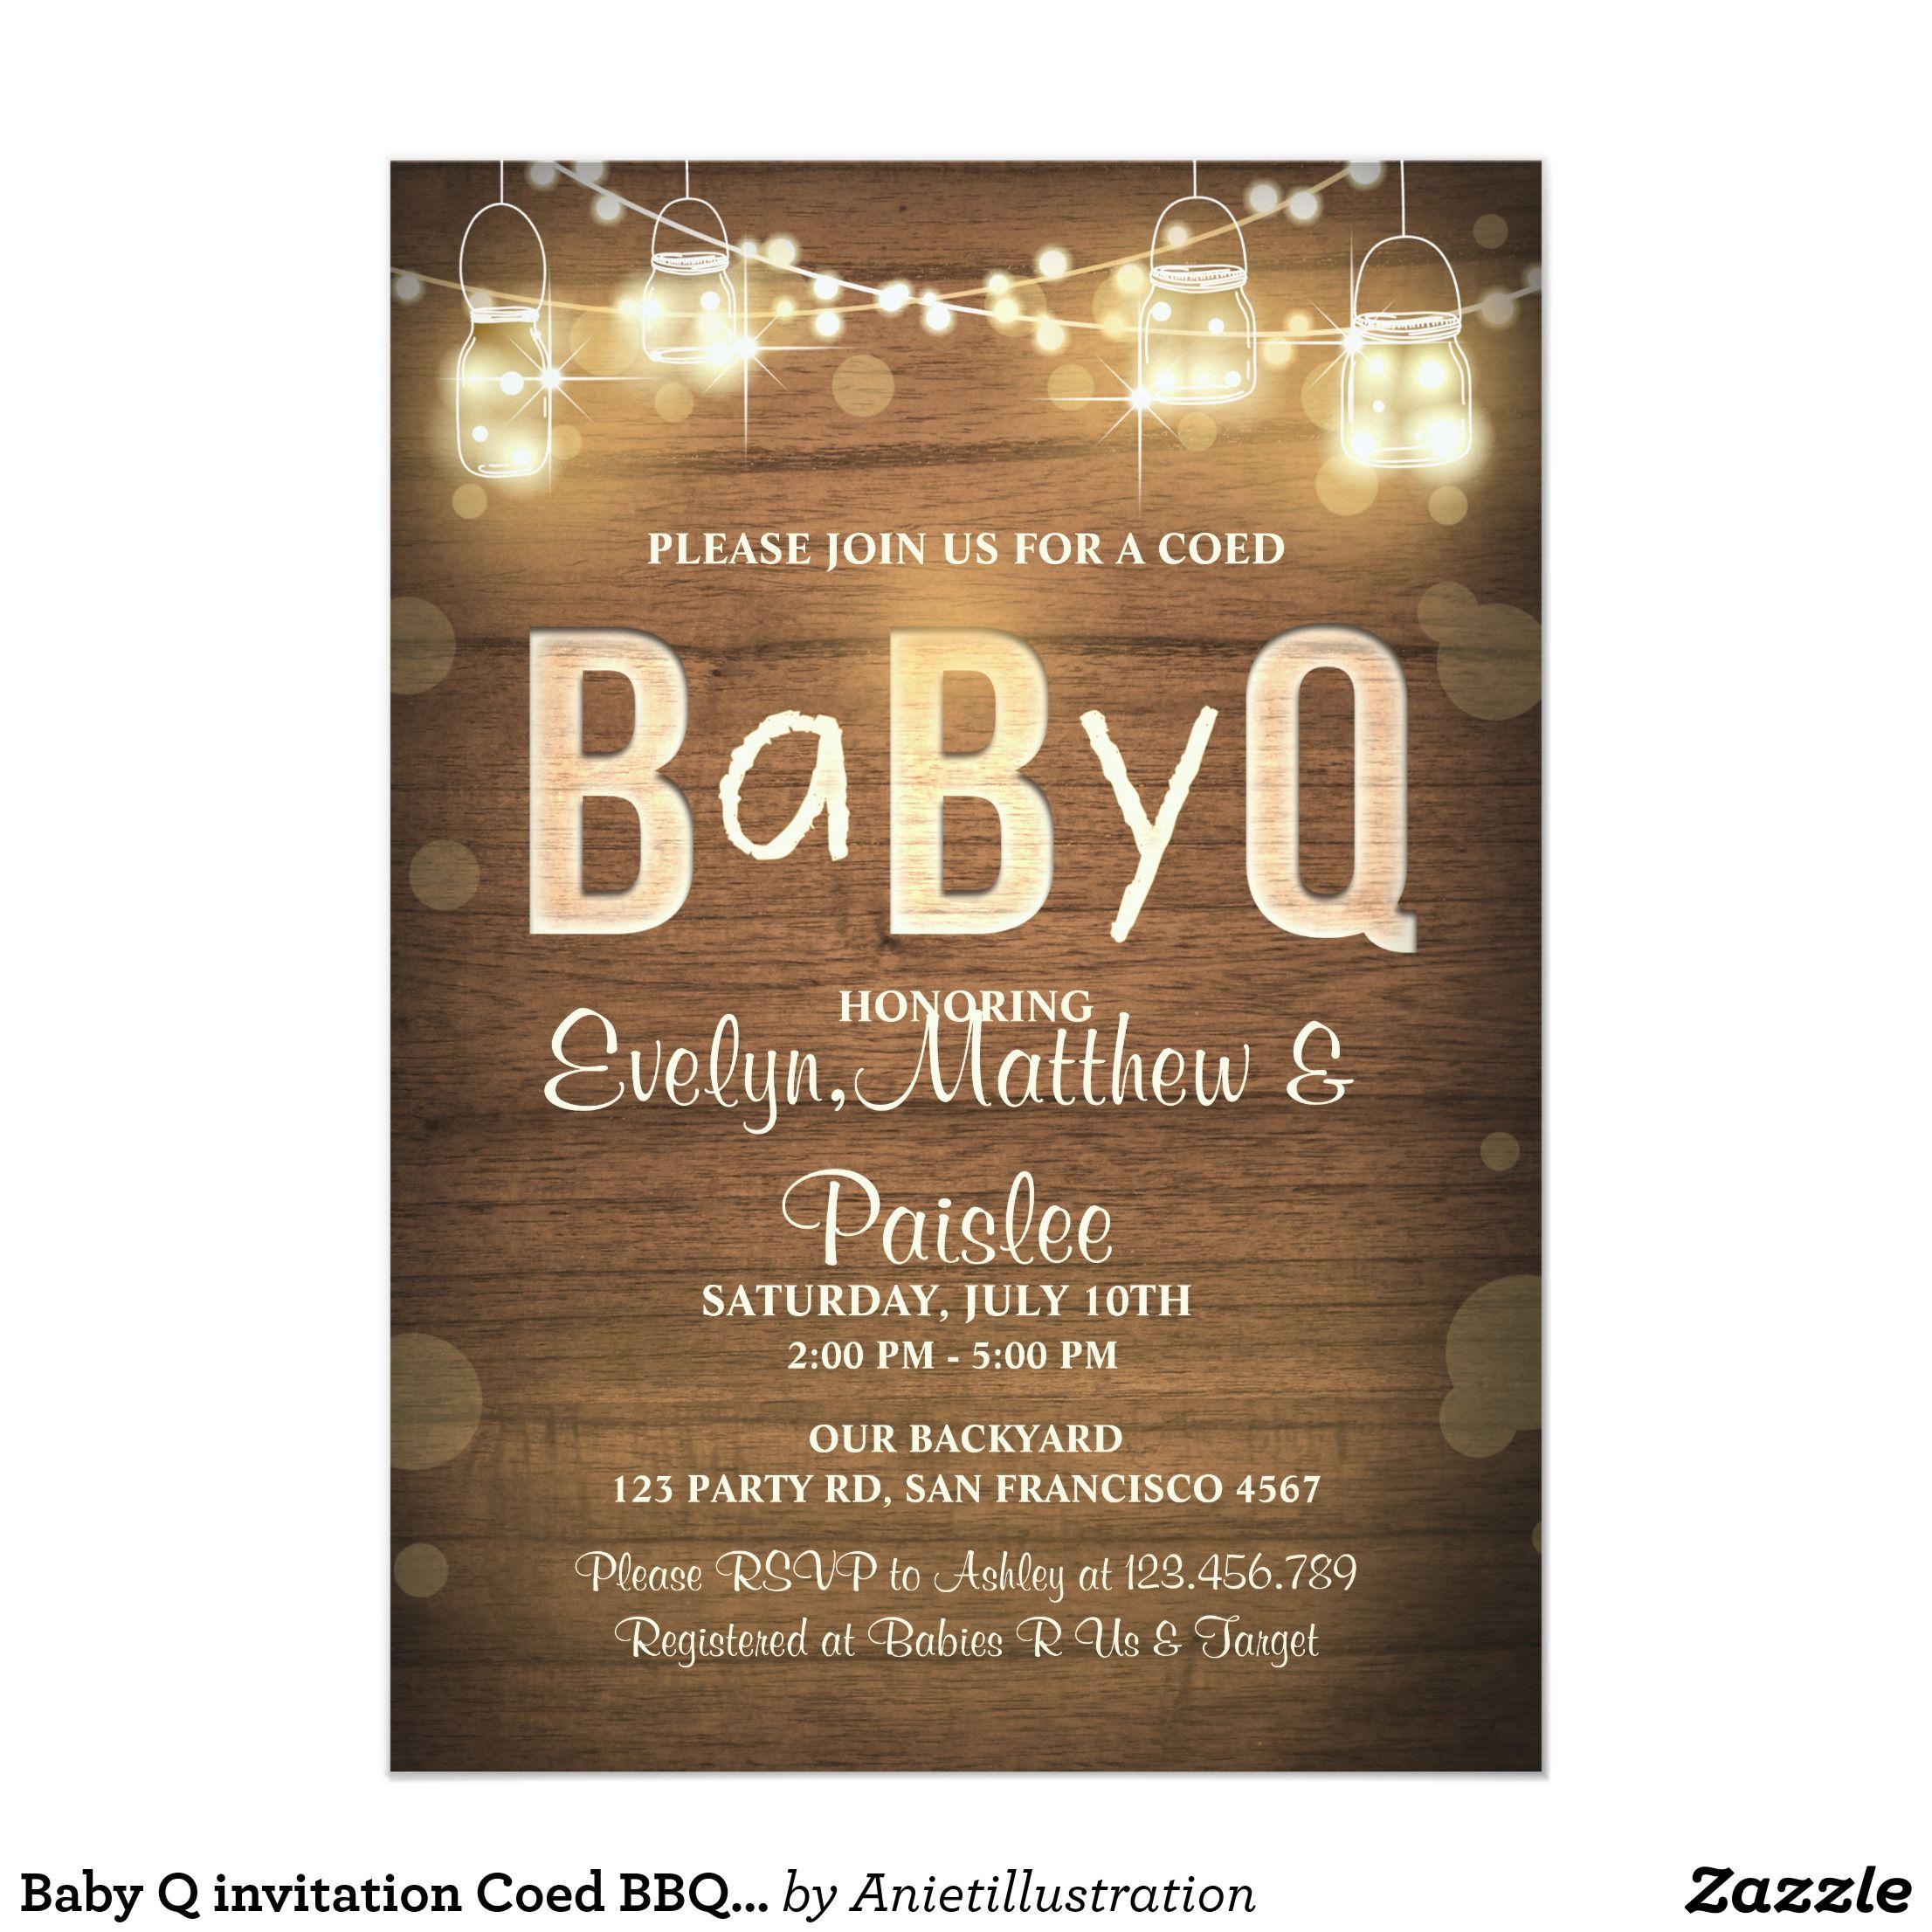 Baby Q invitation Coed BBQ Baby Shower Rustic Wood | baby shower ...